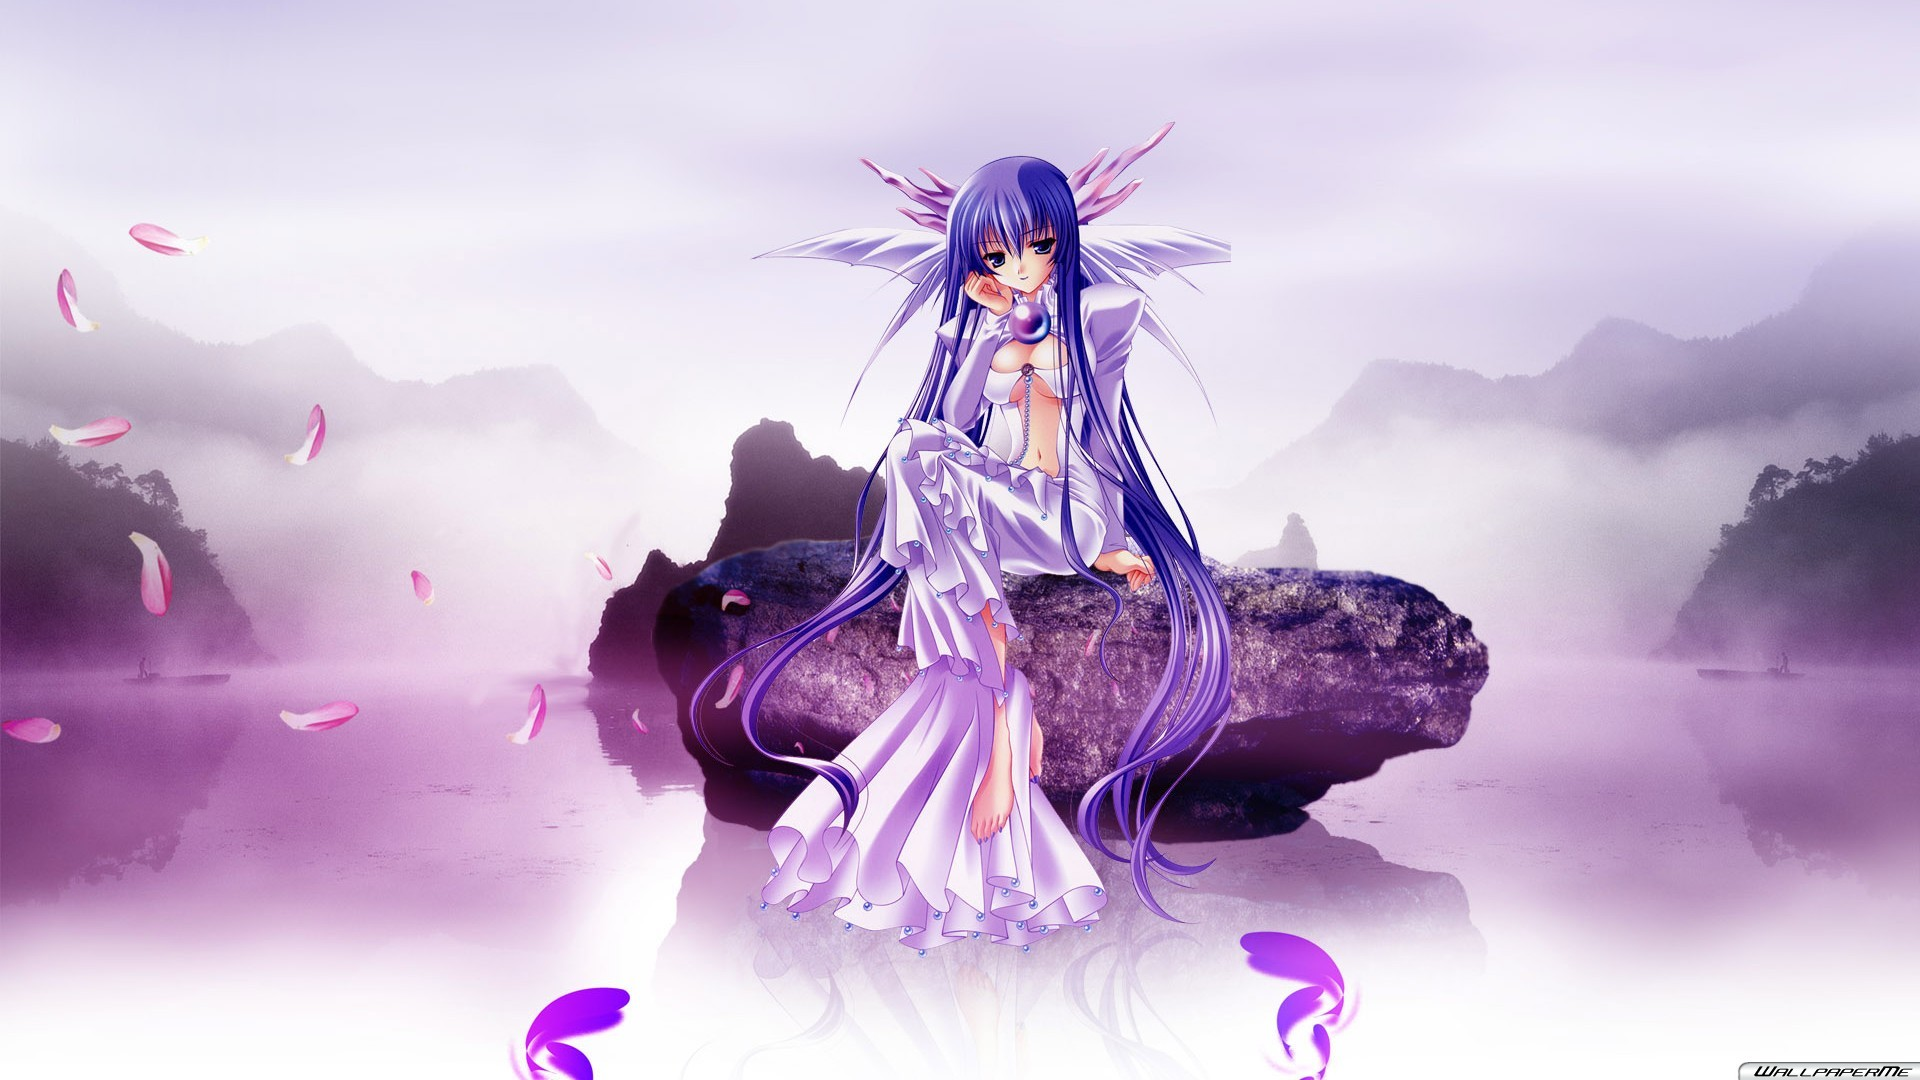 Cute Girl Hd Wallpapers 1080p Die 76 Besten Anime Hintergrundbilder